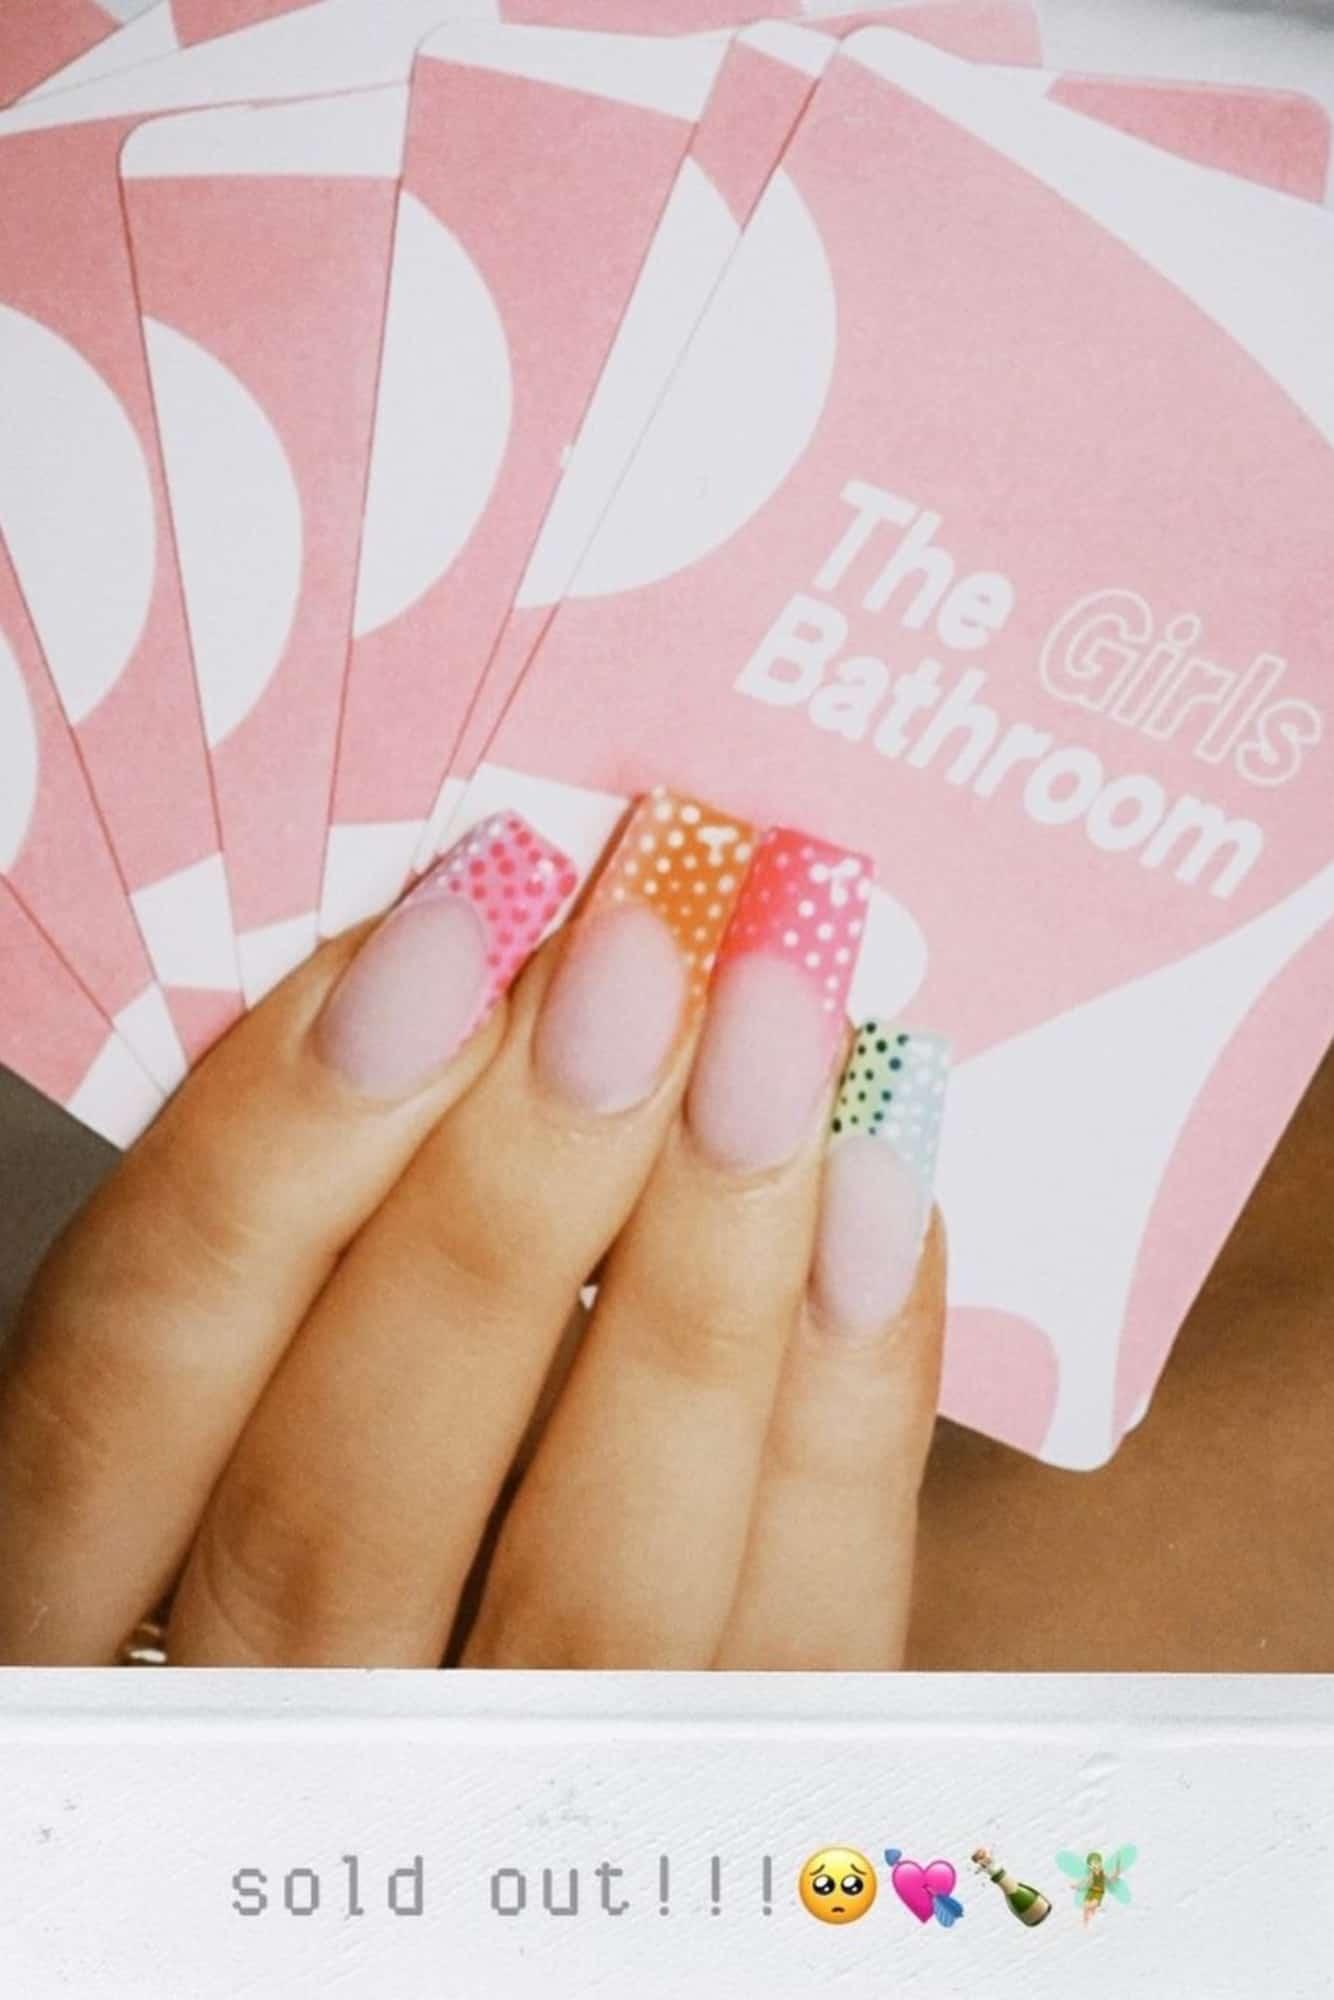 the-girls-bathroom-game-sophia-and-cinzia